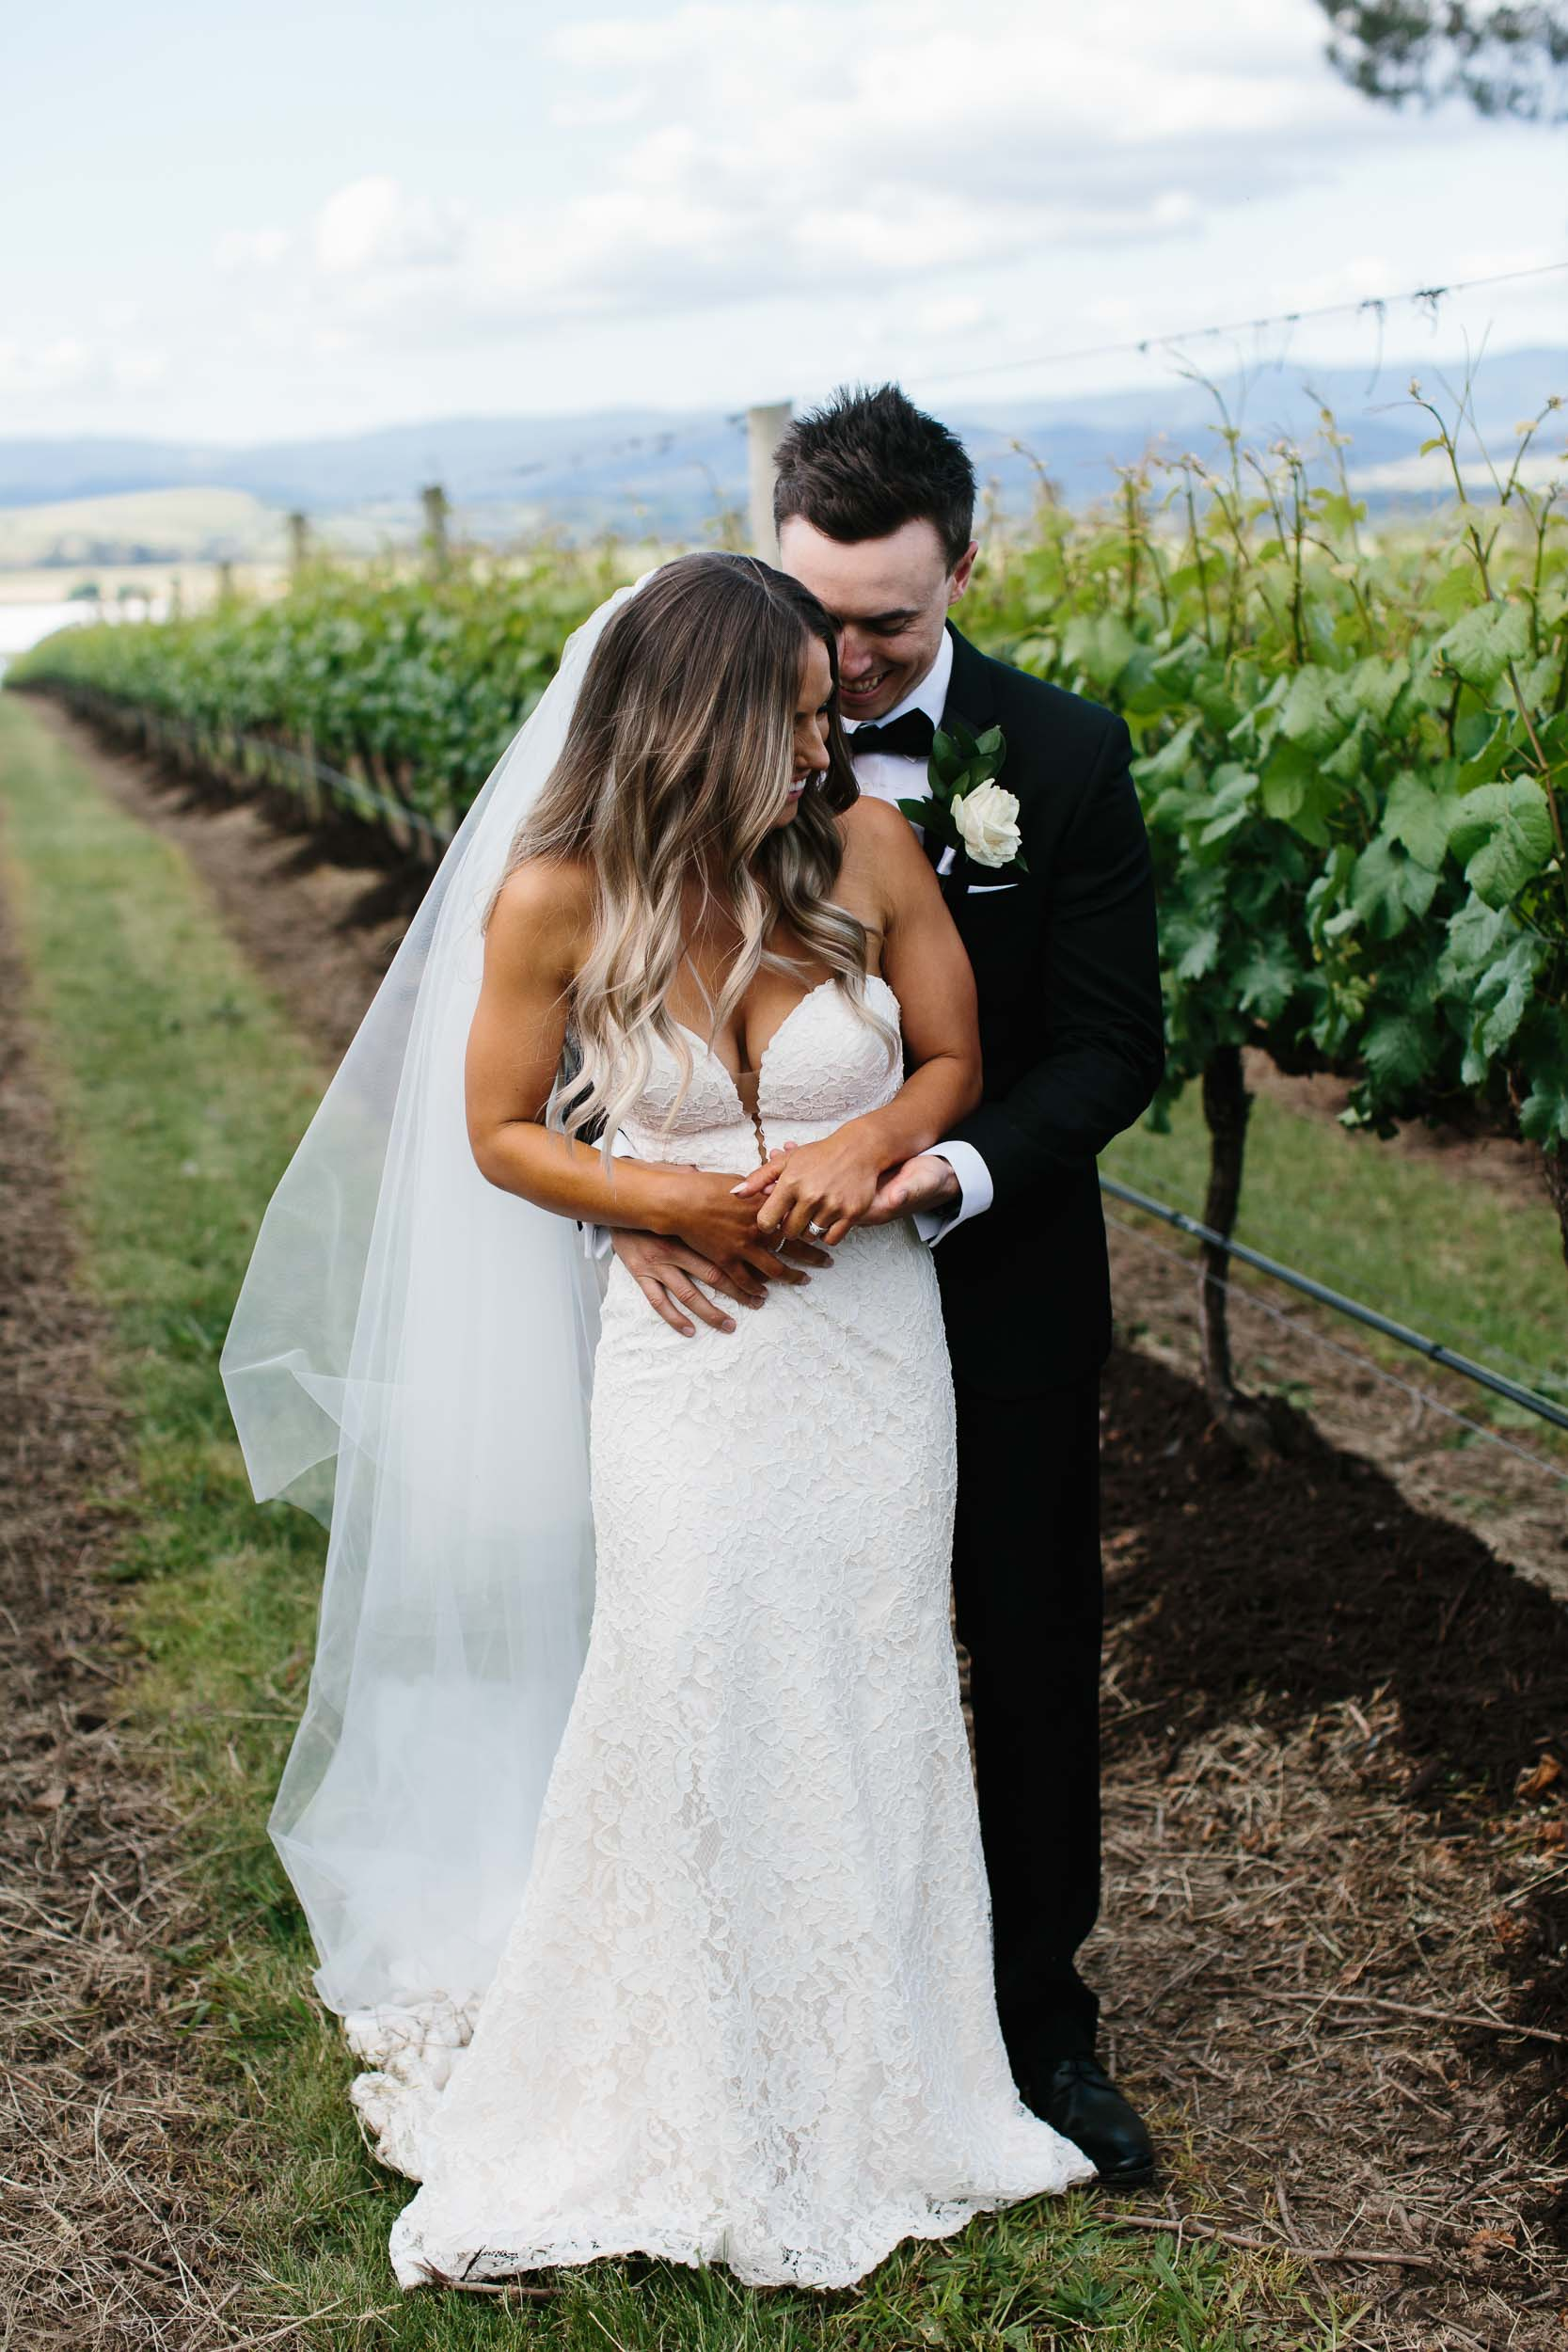 Kas-Richards-Stones-of-the-Yarra-Valley-Wedding-629.jpg